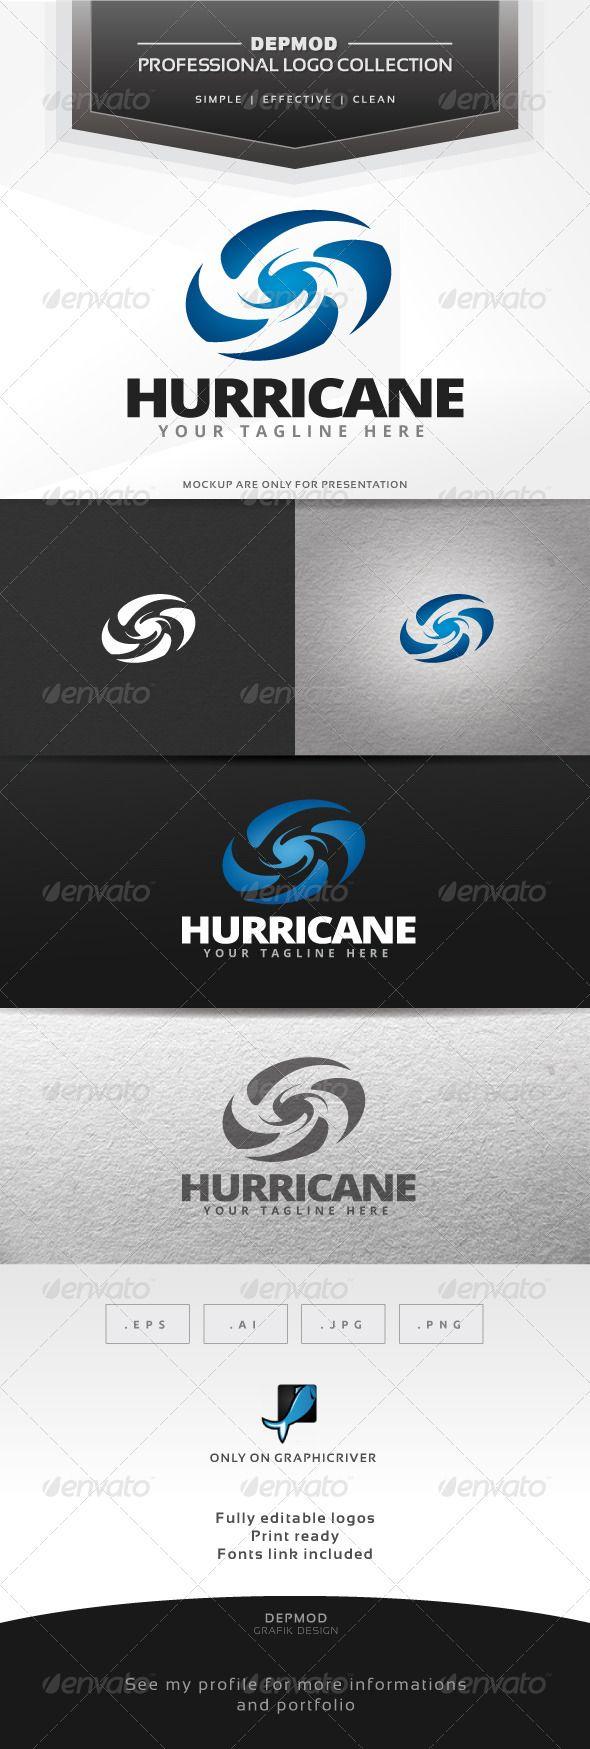 Hurricane Logo — Vector EPS #tornado #web • Available here → https://graphicriver.net/item/hurricane-logo/7014192?ref=pxcr